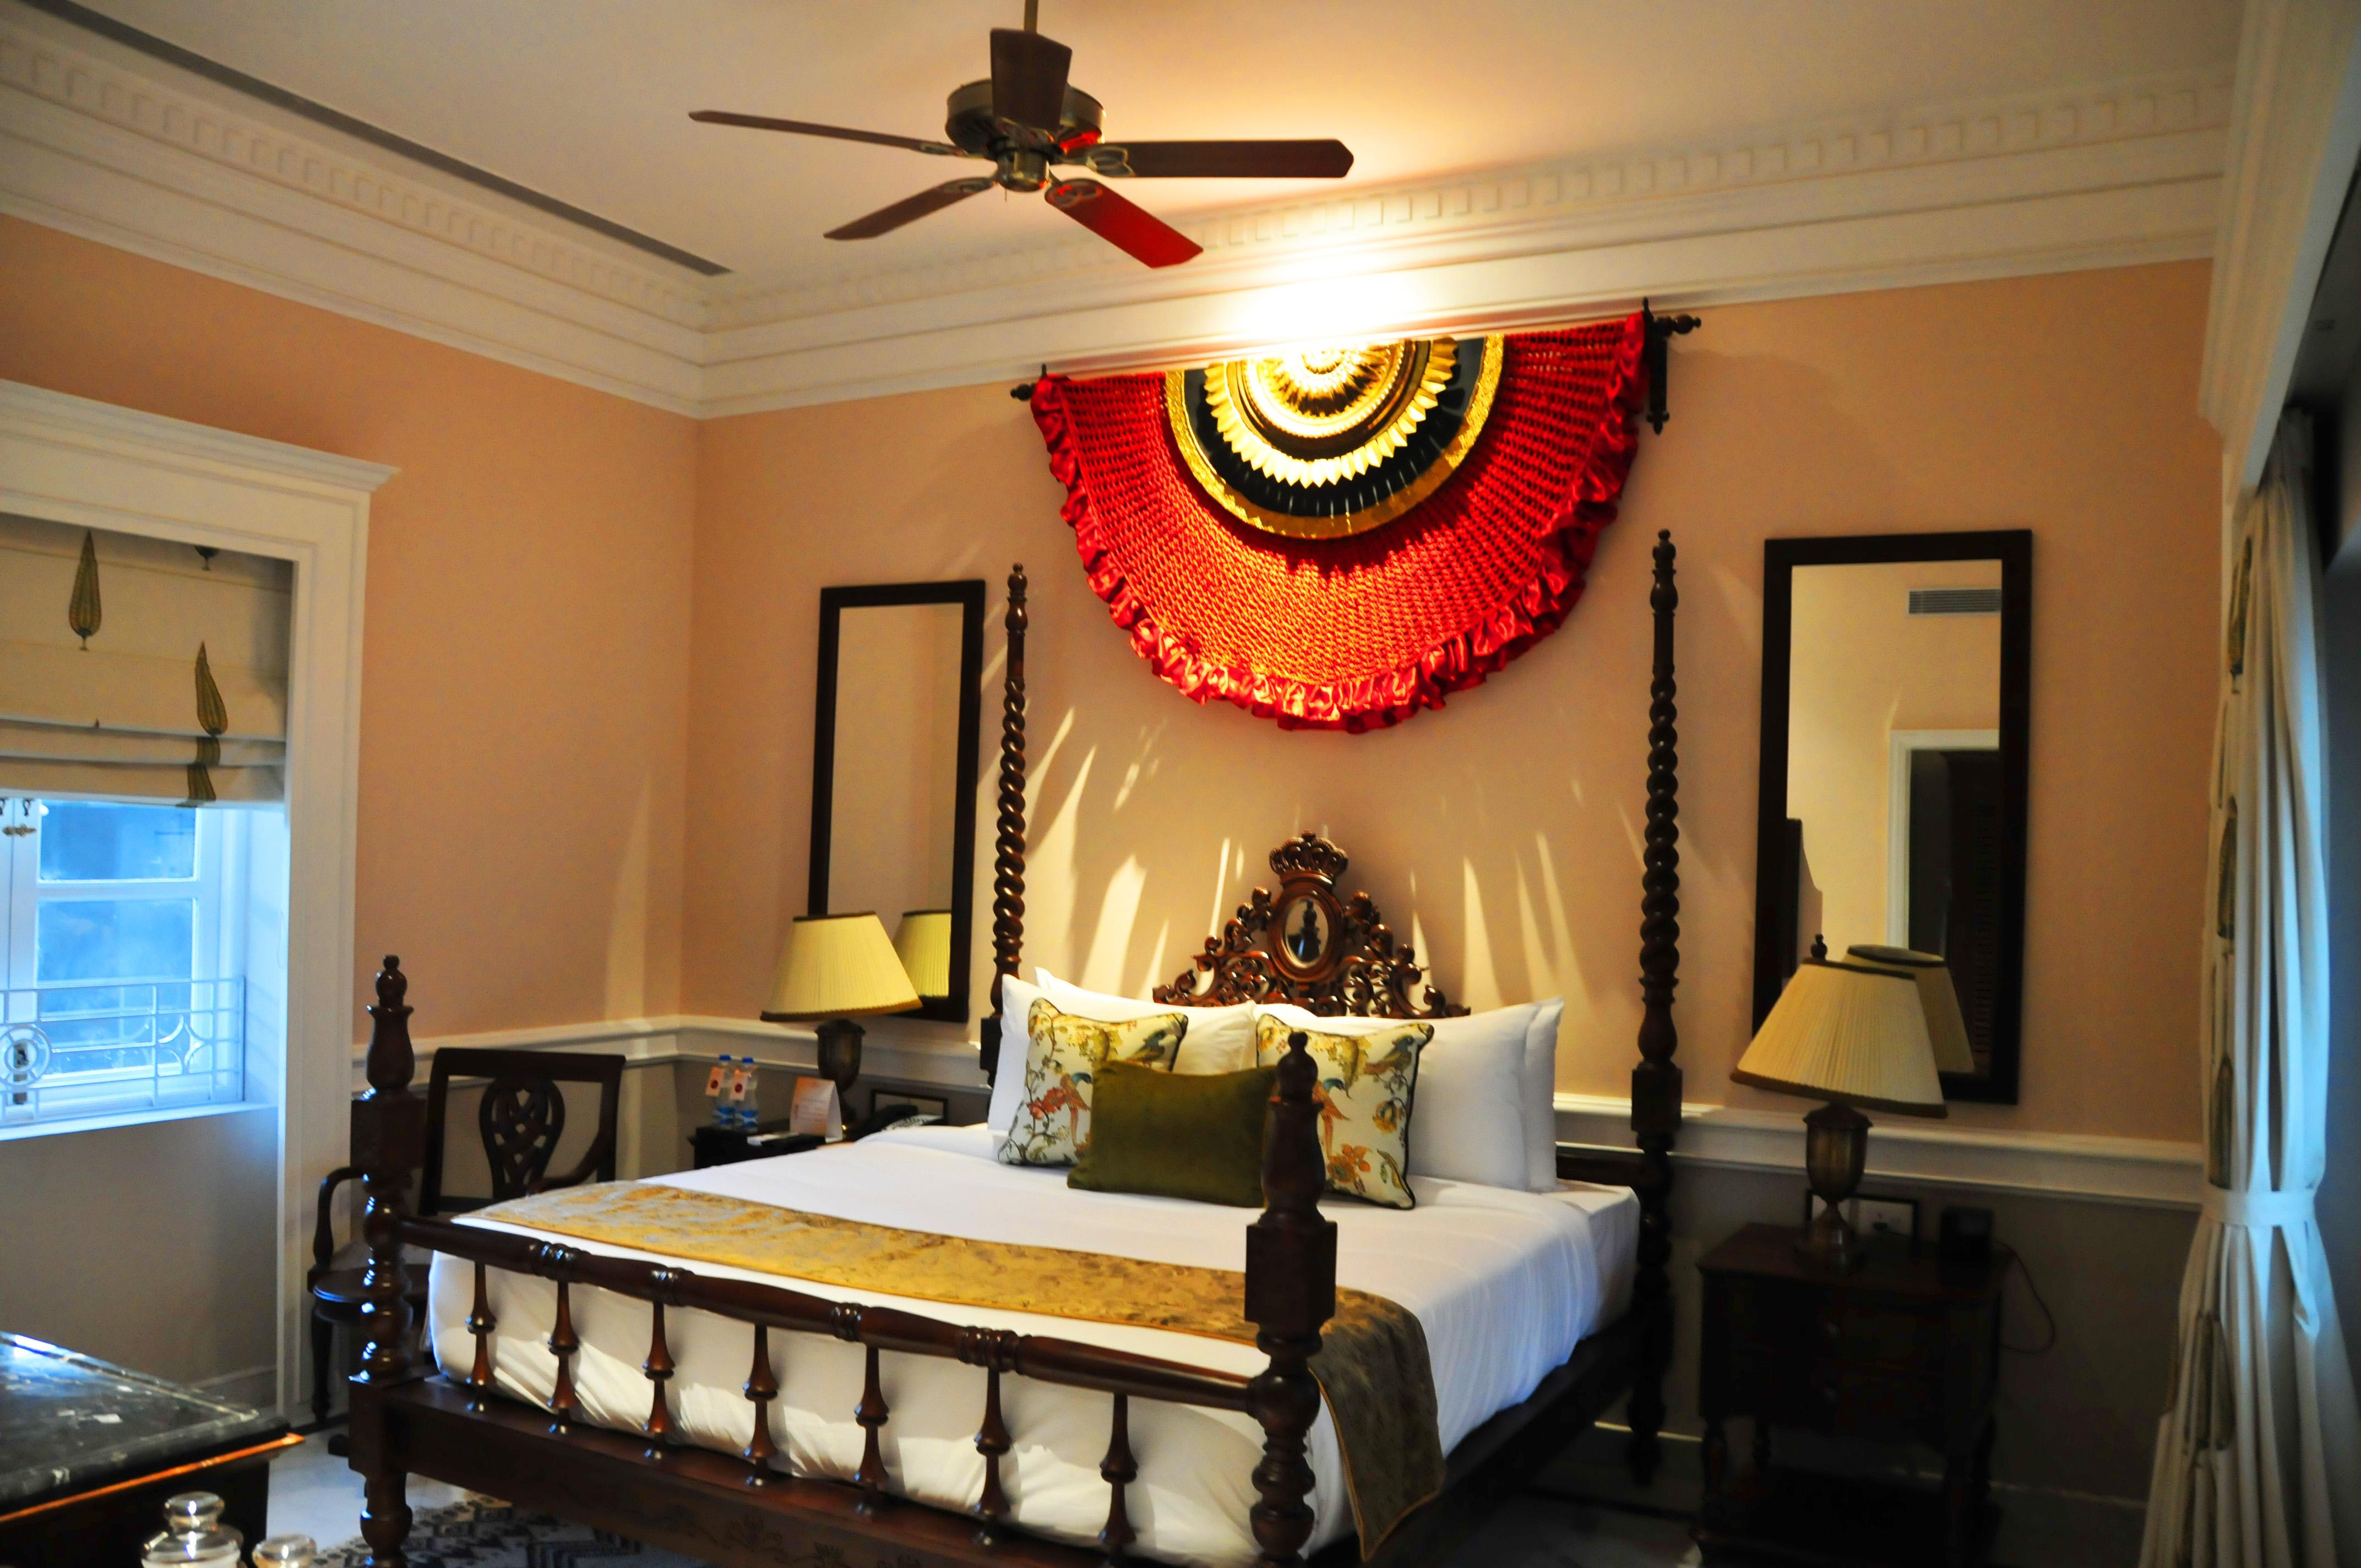 Raajkutir A Boutique Hotel That Rekindles Memories Of 19th Century Bengal Outlook Traveller,Minimalist Interior Design Concept Board